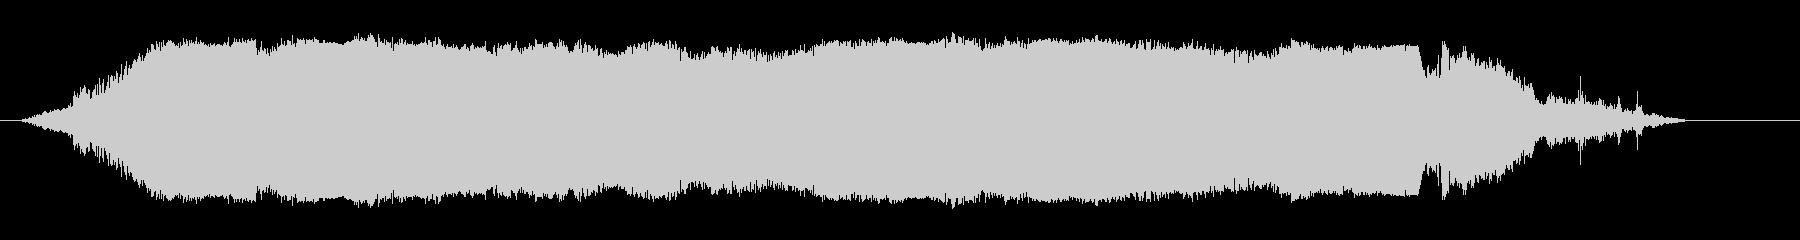 GTSカー;インターンアンドアウト...の未再生の波形